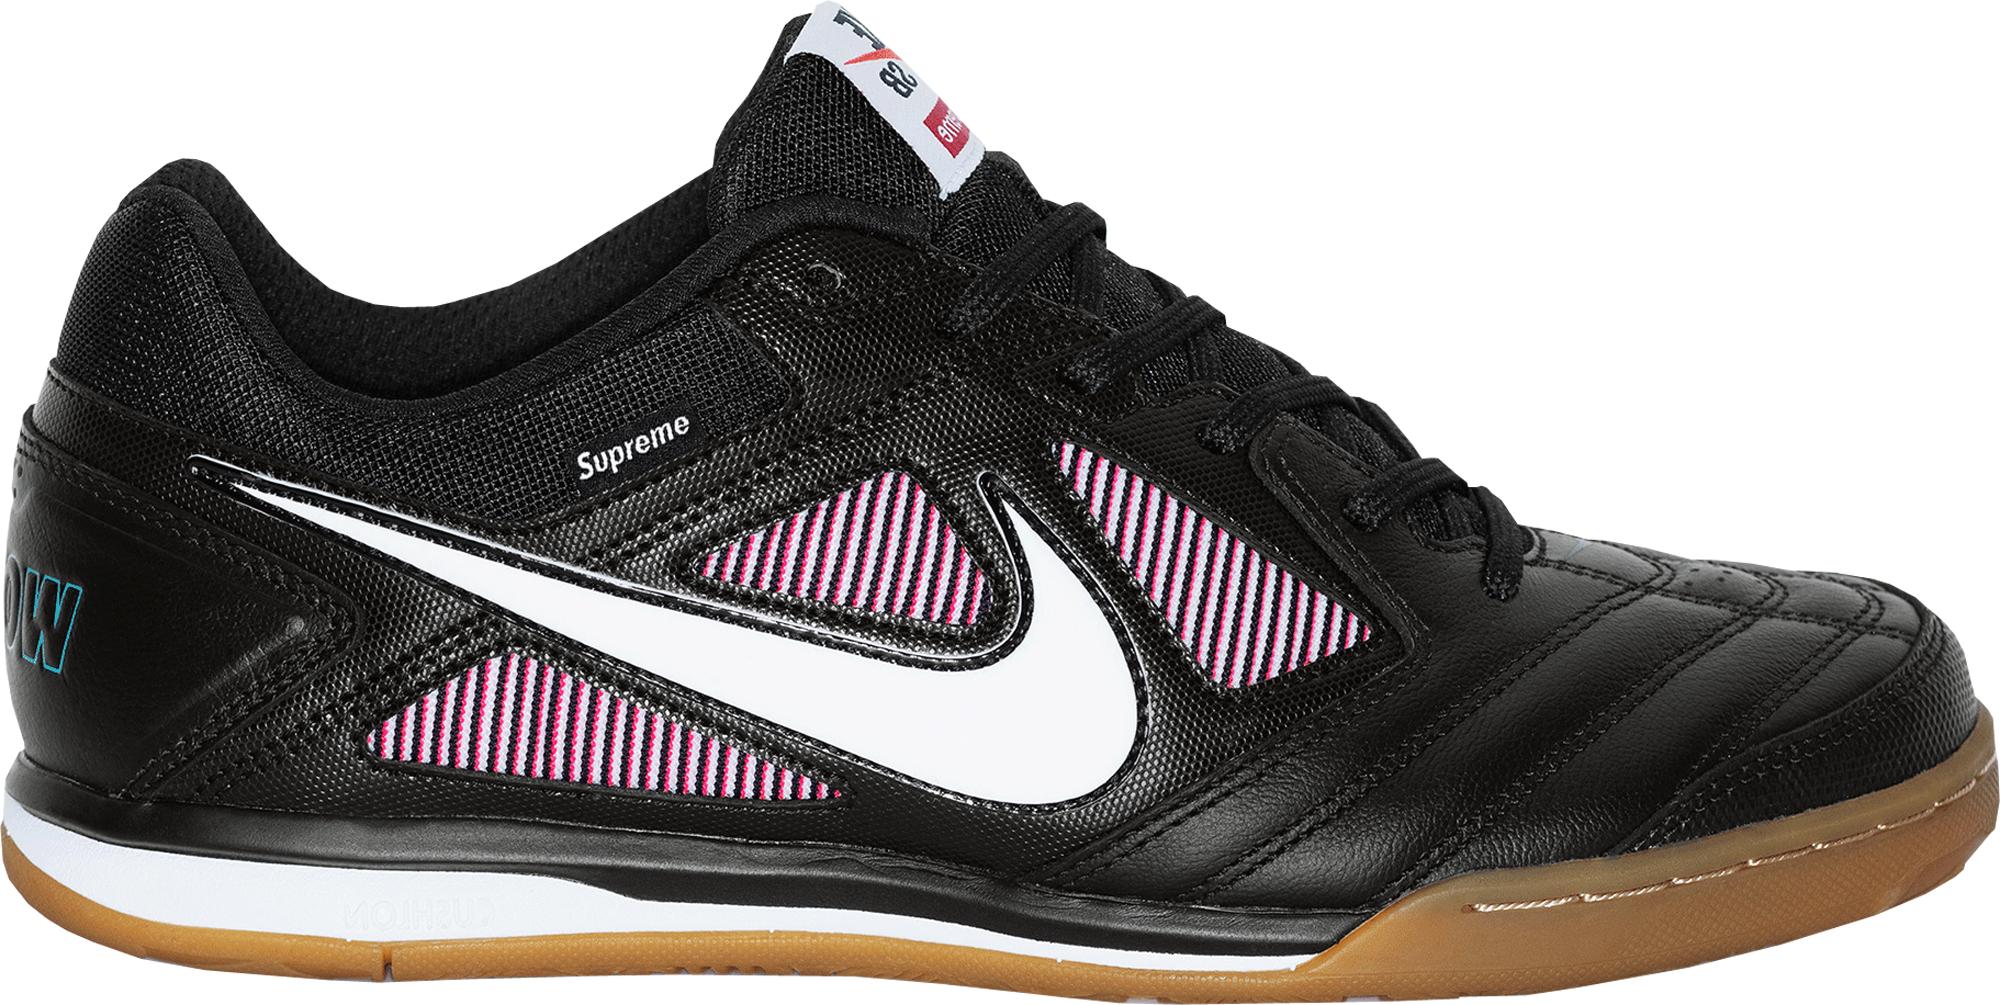 separation shoes 33042 b6a83 ... switzerland nike sb gato supreme black ar9821 001 a1c61 5b28d